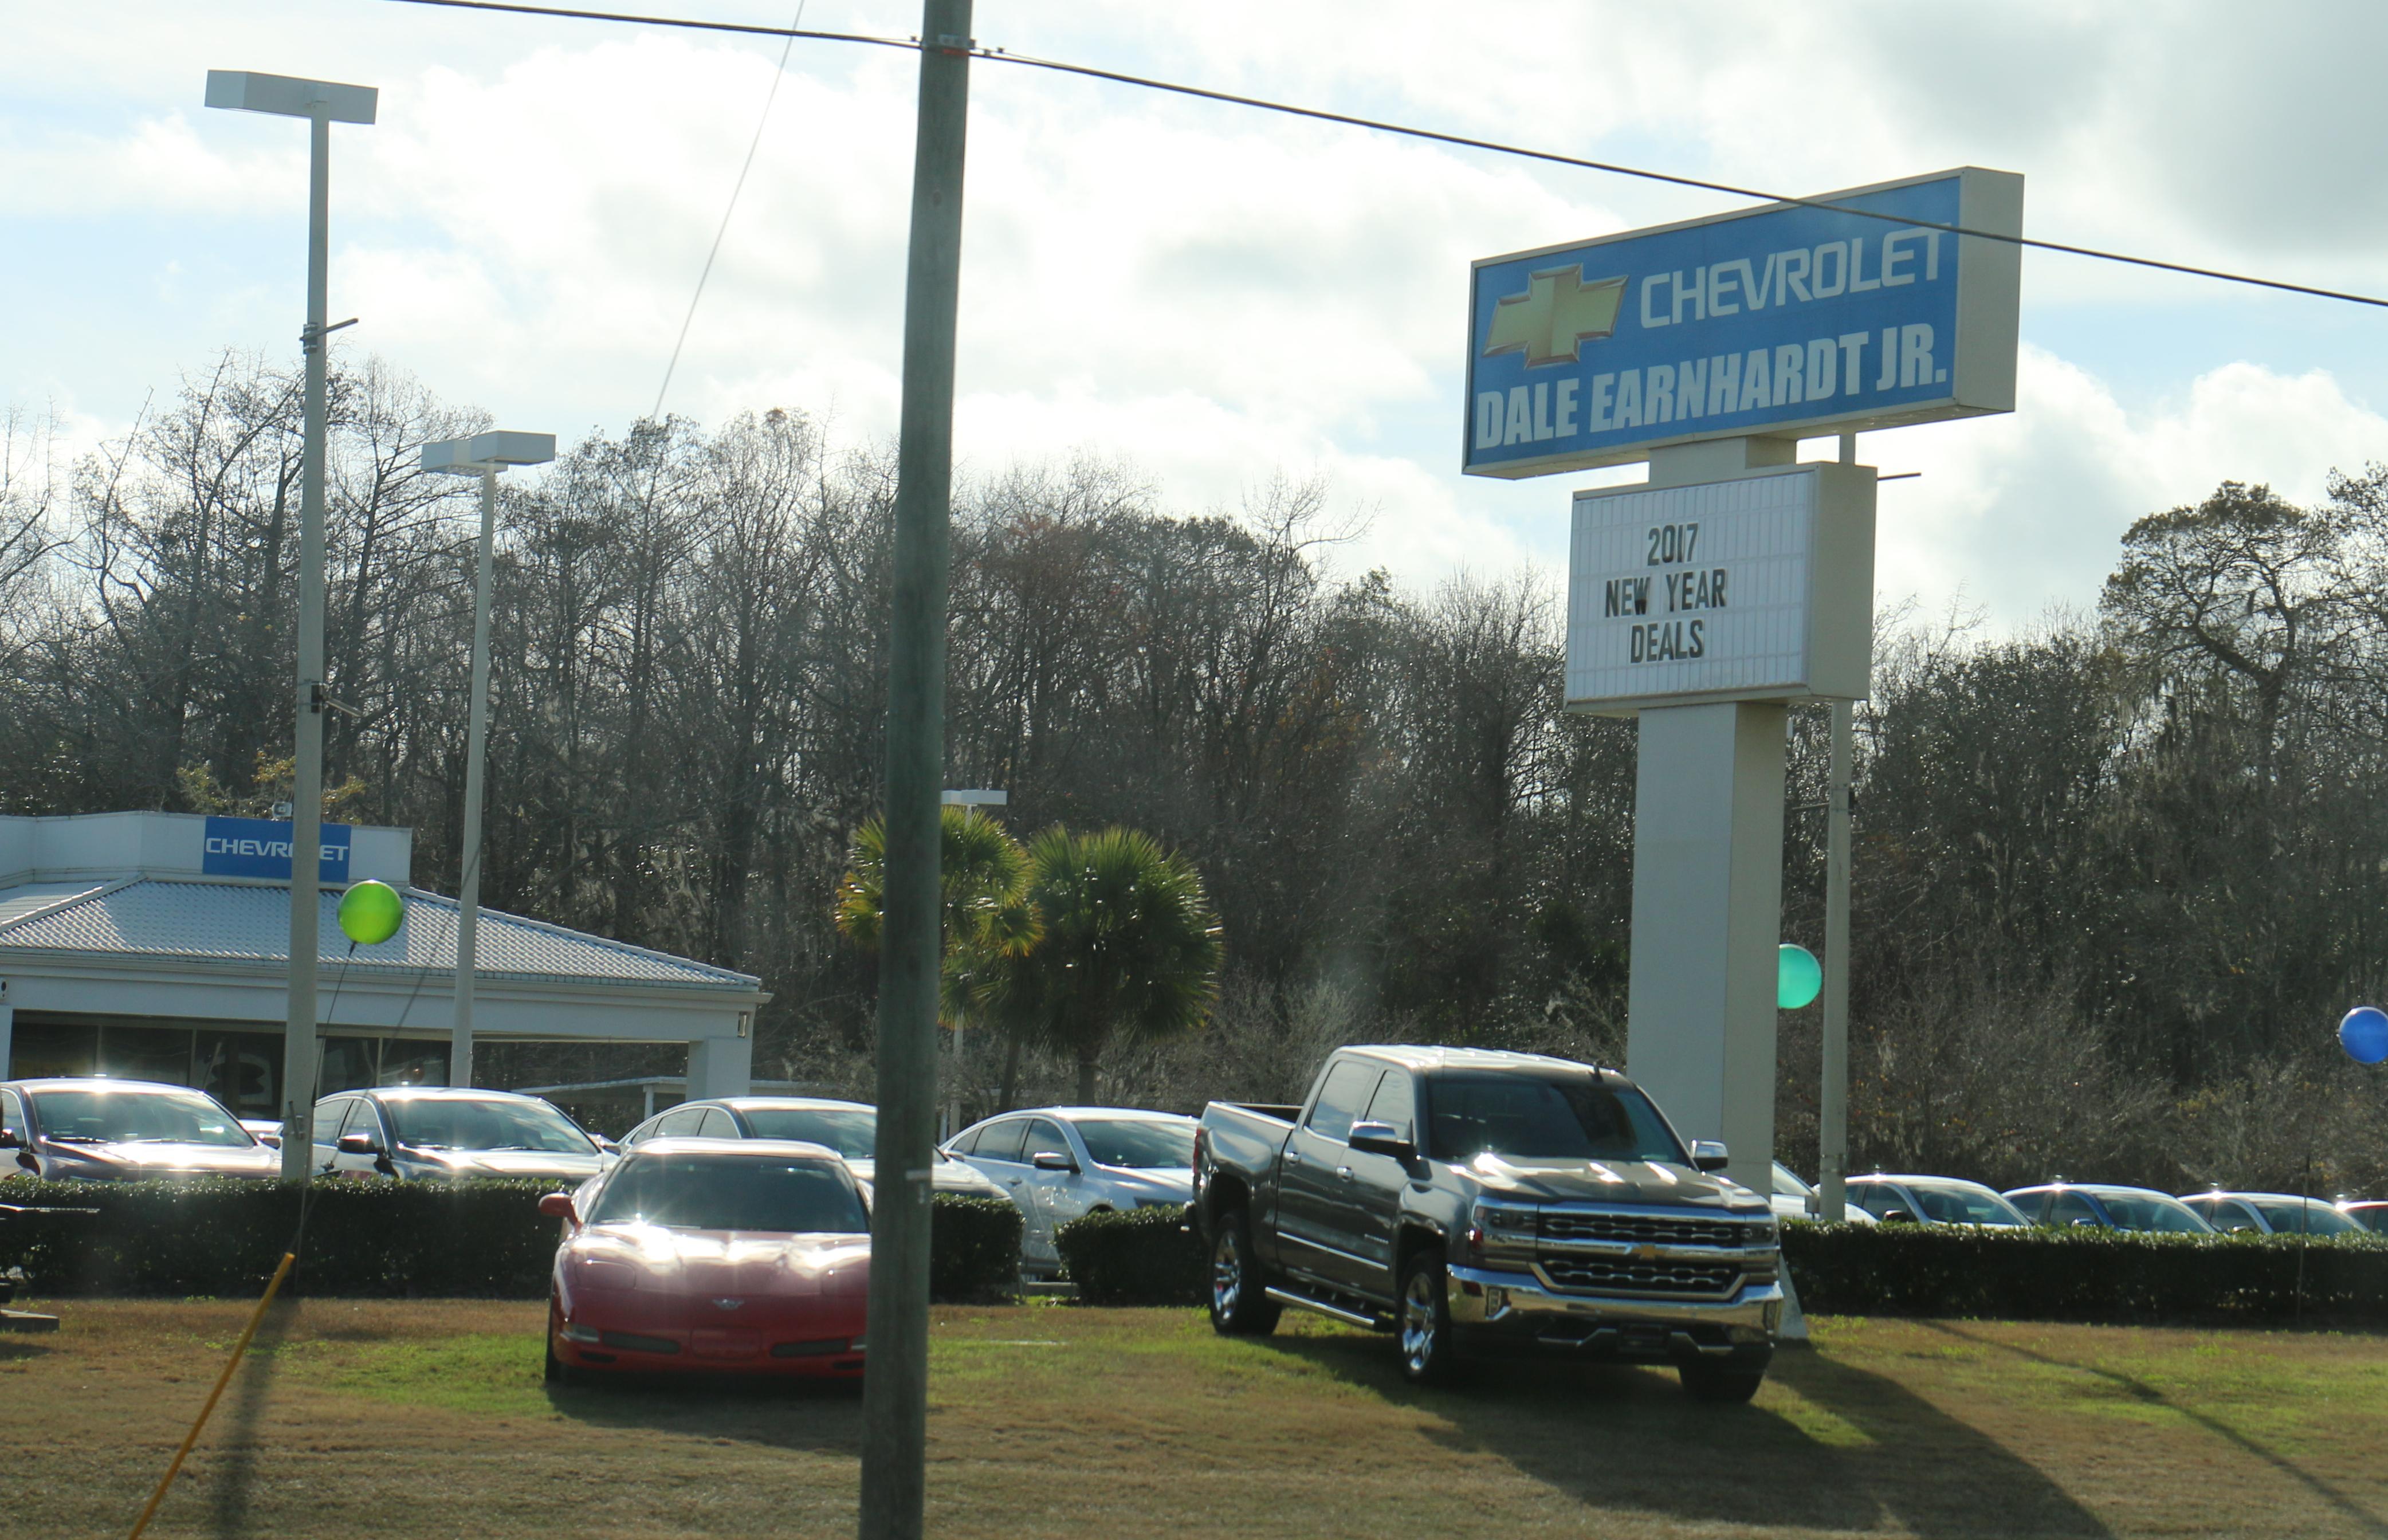 File:Dale Earnhardt Jr Chevrolet Tallahassee